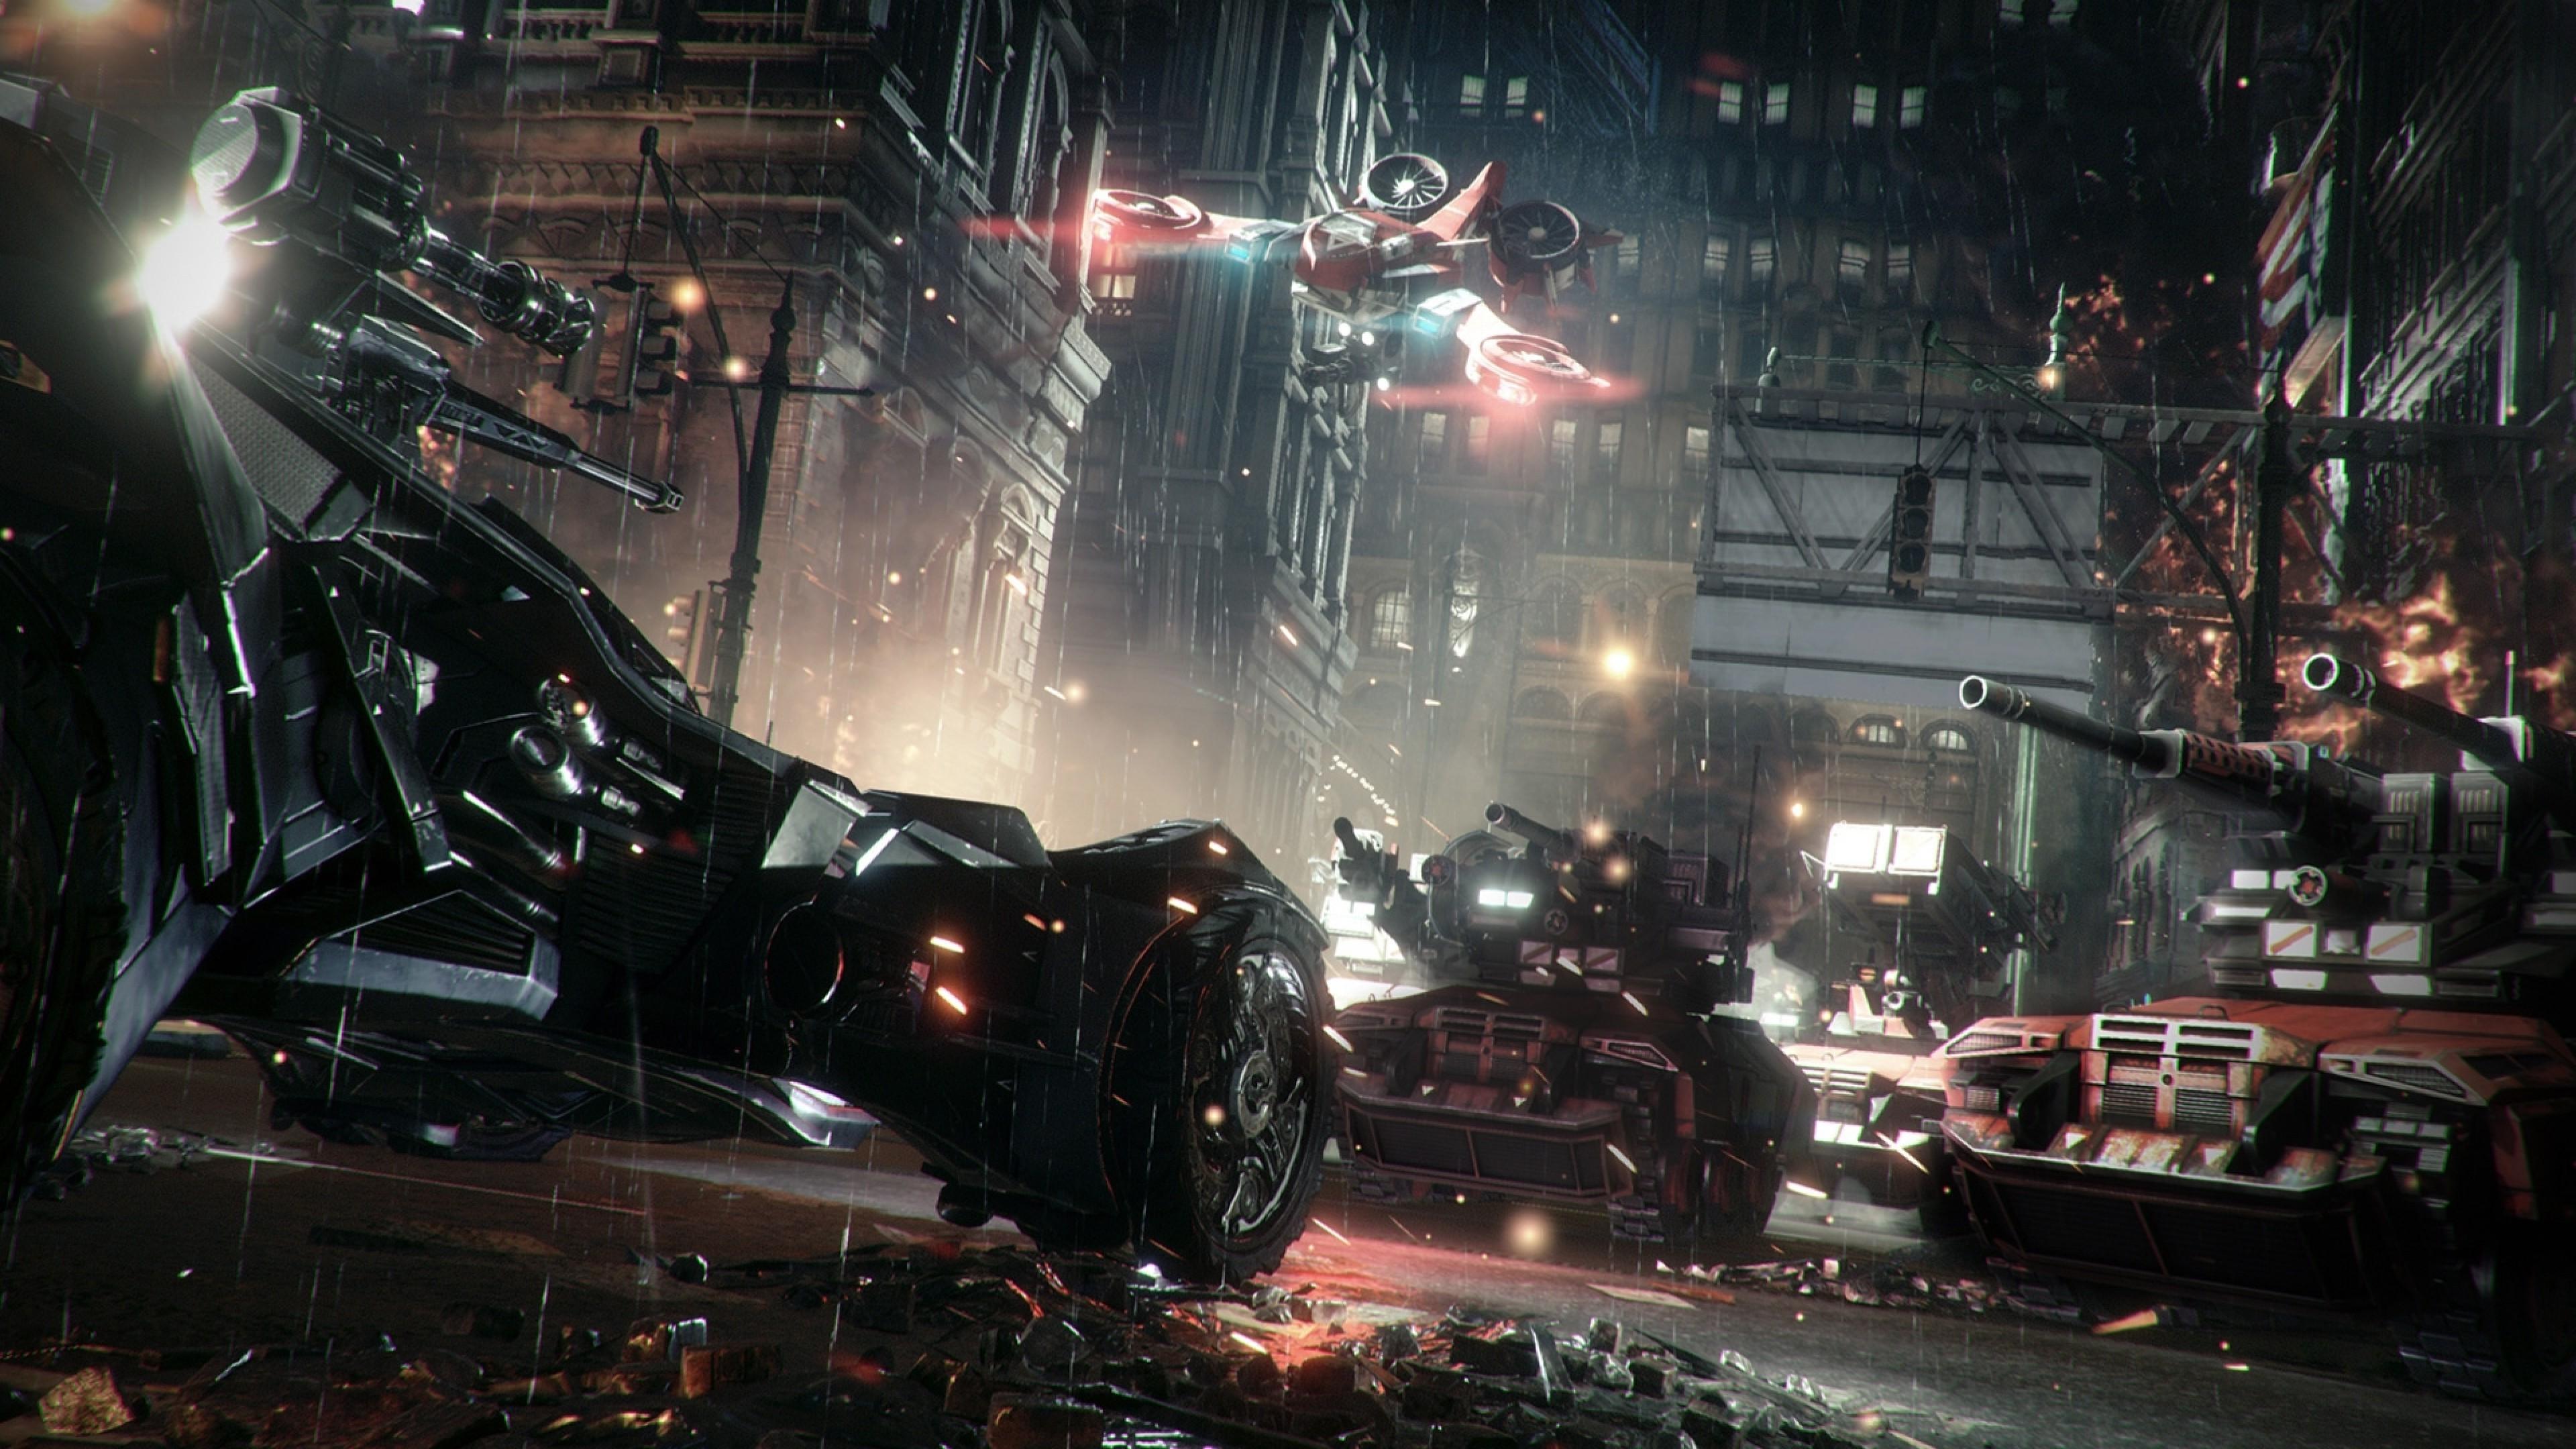 Batman: Arkham Knight, Rocksteady Studios, Batman, Gotham City, Video  Games, Batmobile Wallpapers HD / Desktop and Mobile Backgrounds